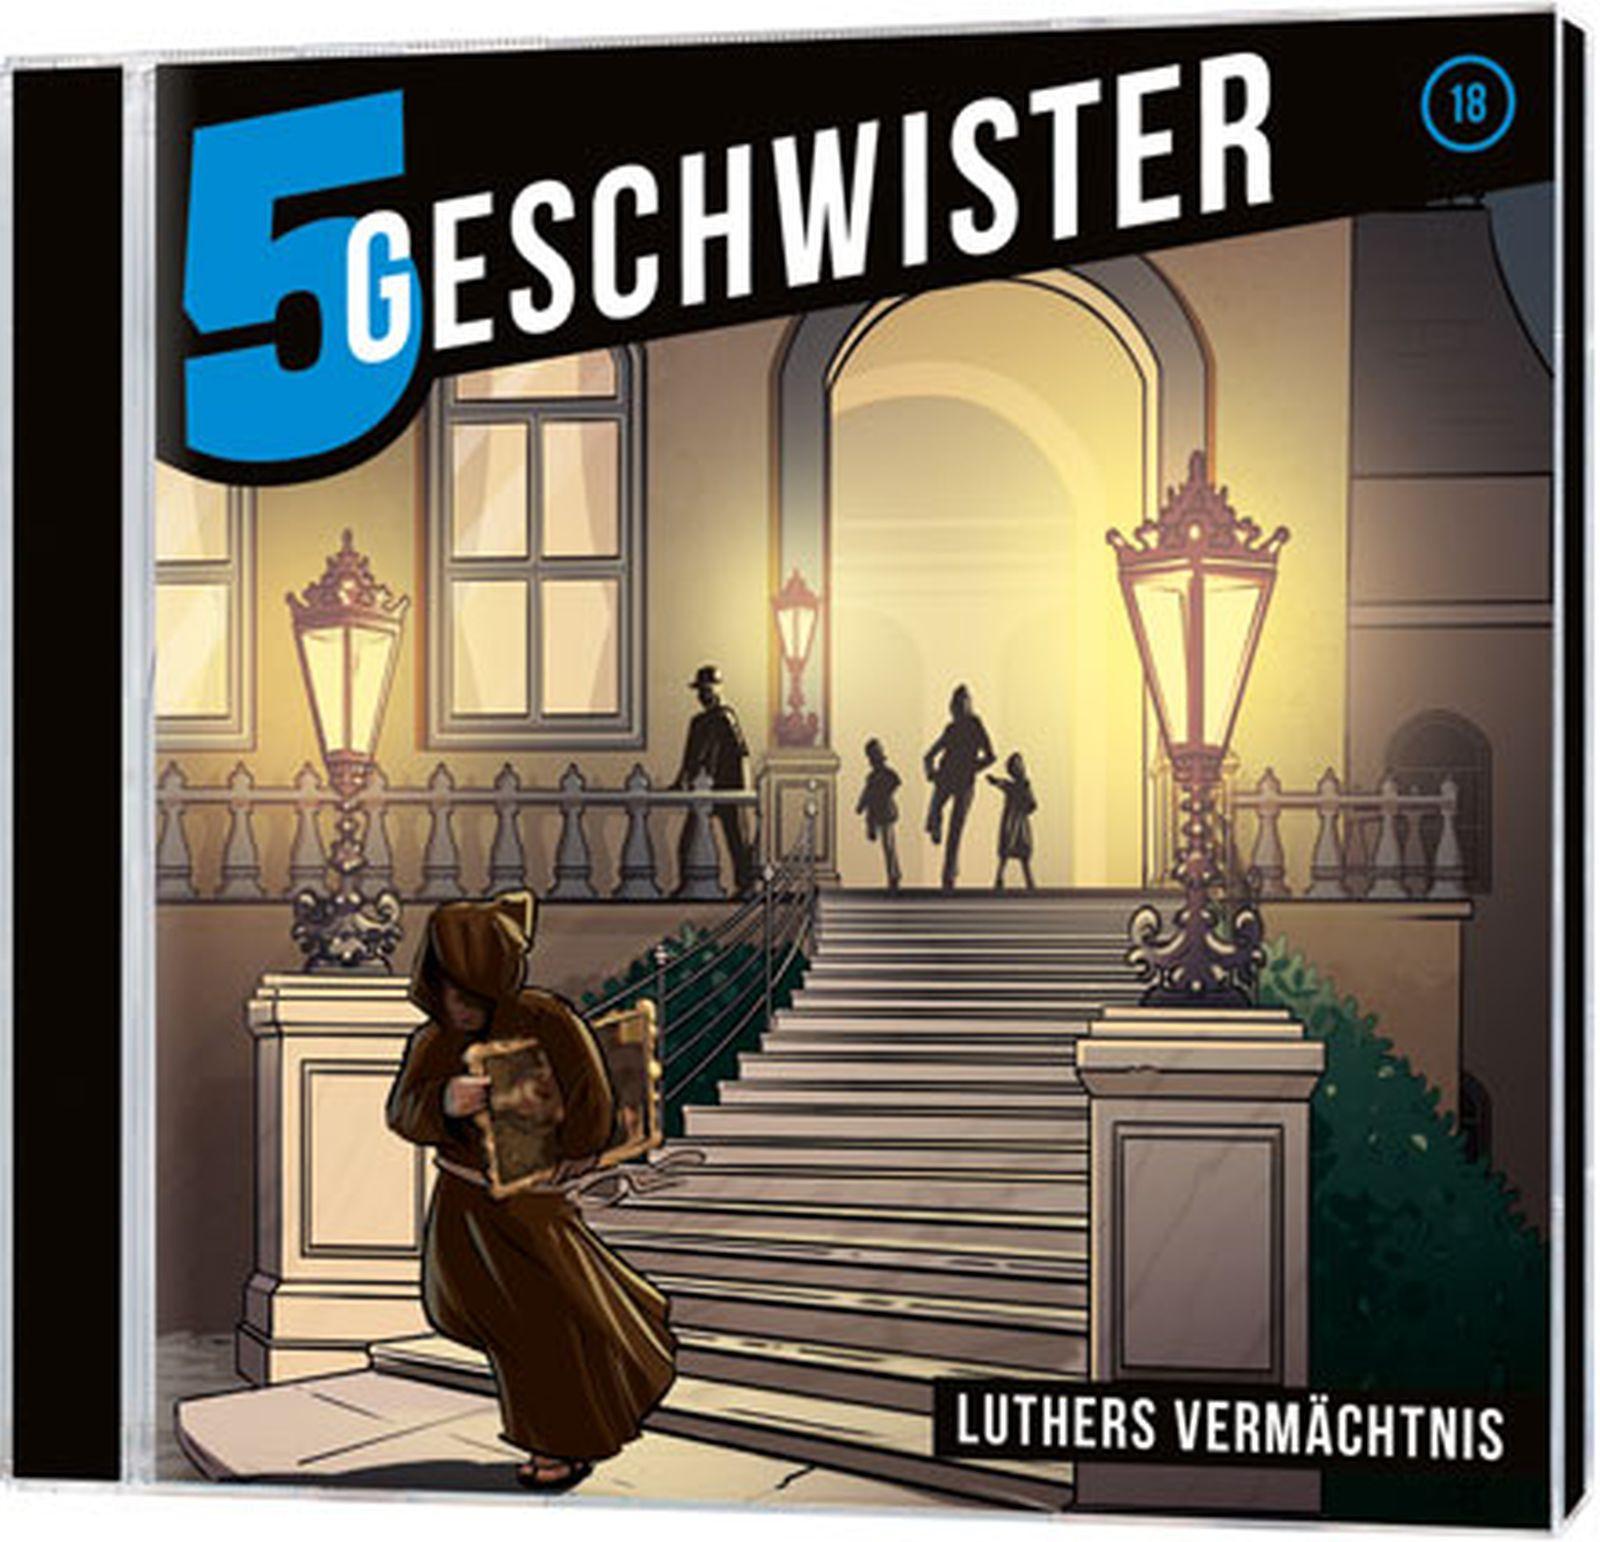 5 Geschwister - Folge 18: Luthers Vermächtnis